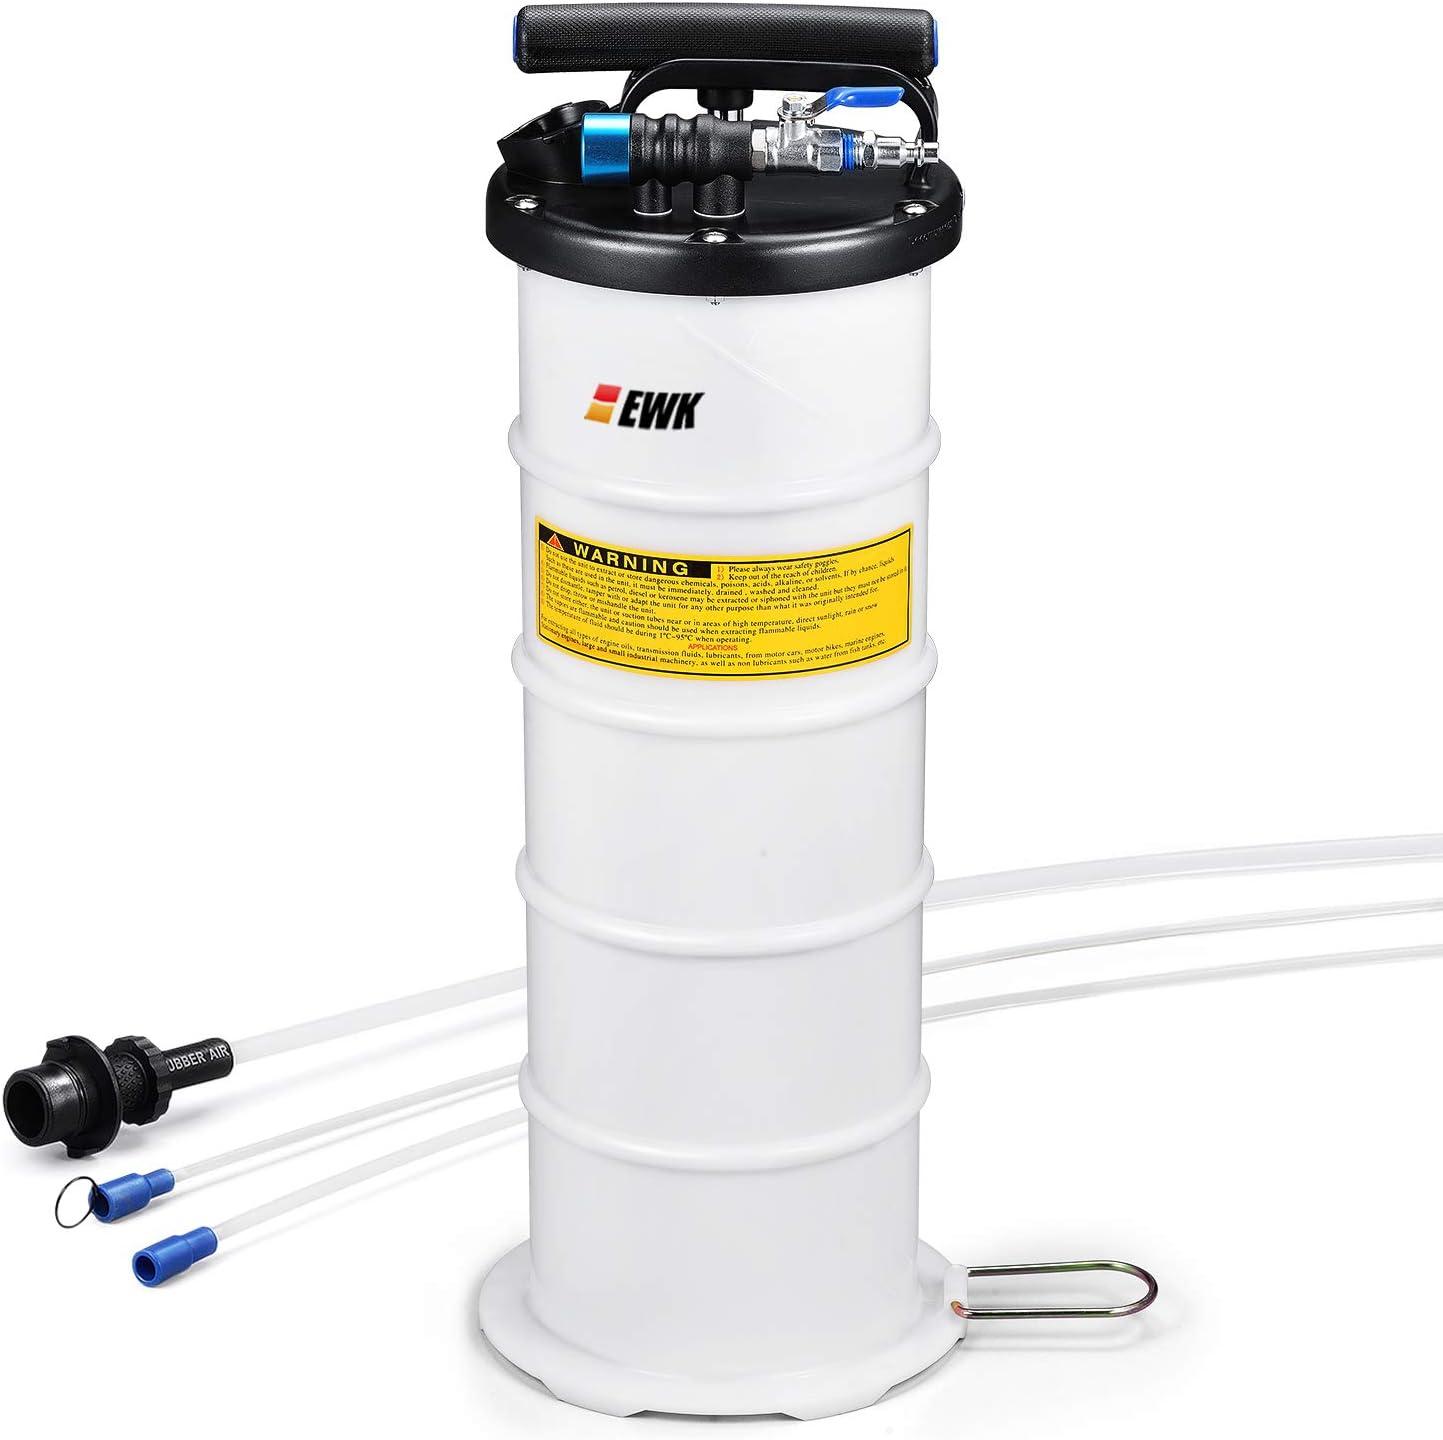 EWK Pneumatic / Manual 6.5L Oil Changer Vacuum Fluid Extractor Pump